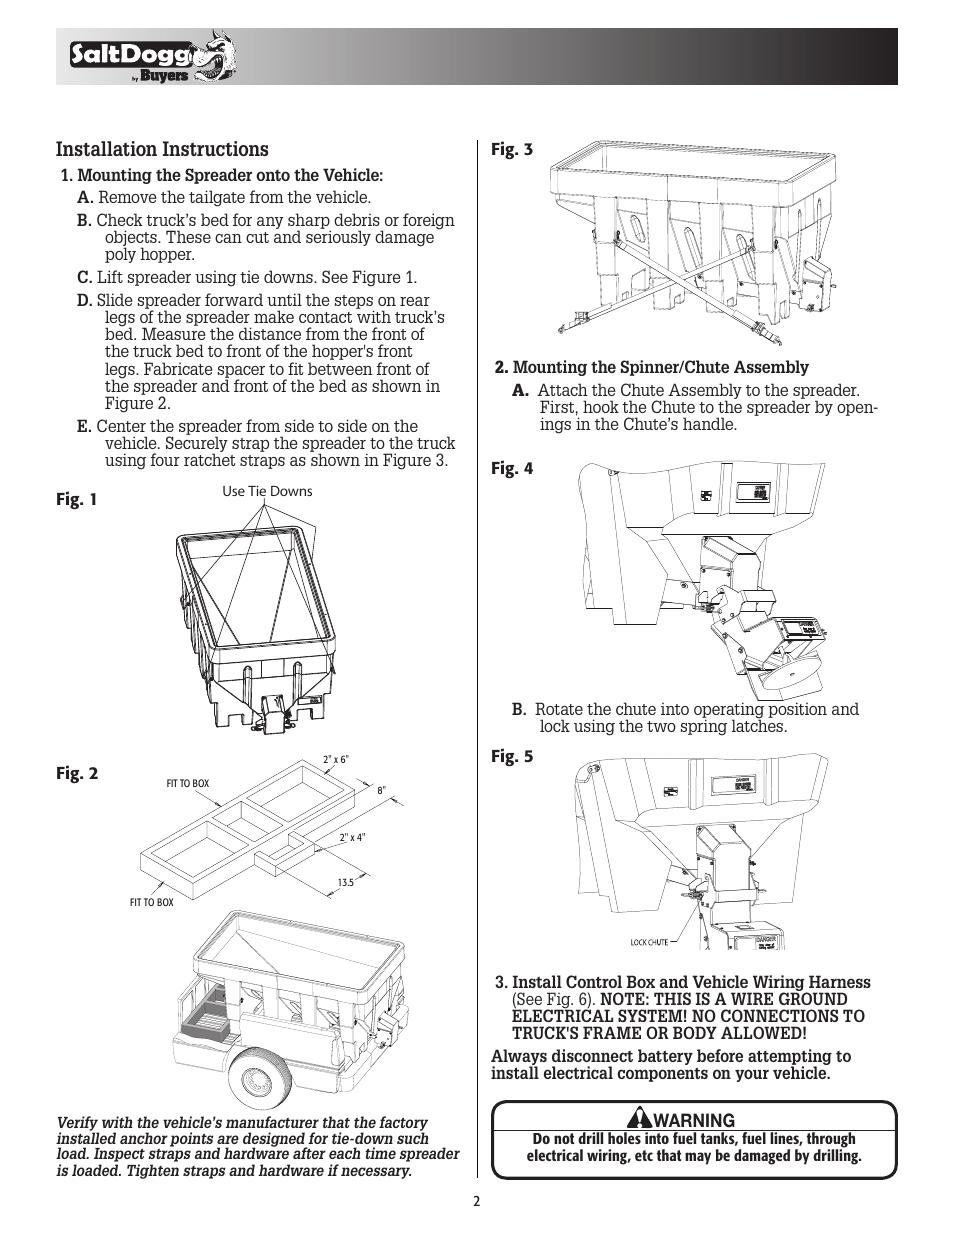 medium resolution of installation instructions saltdogg shpe1500 series electric drive poly hopper spreader v 2 user manual page 2 8